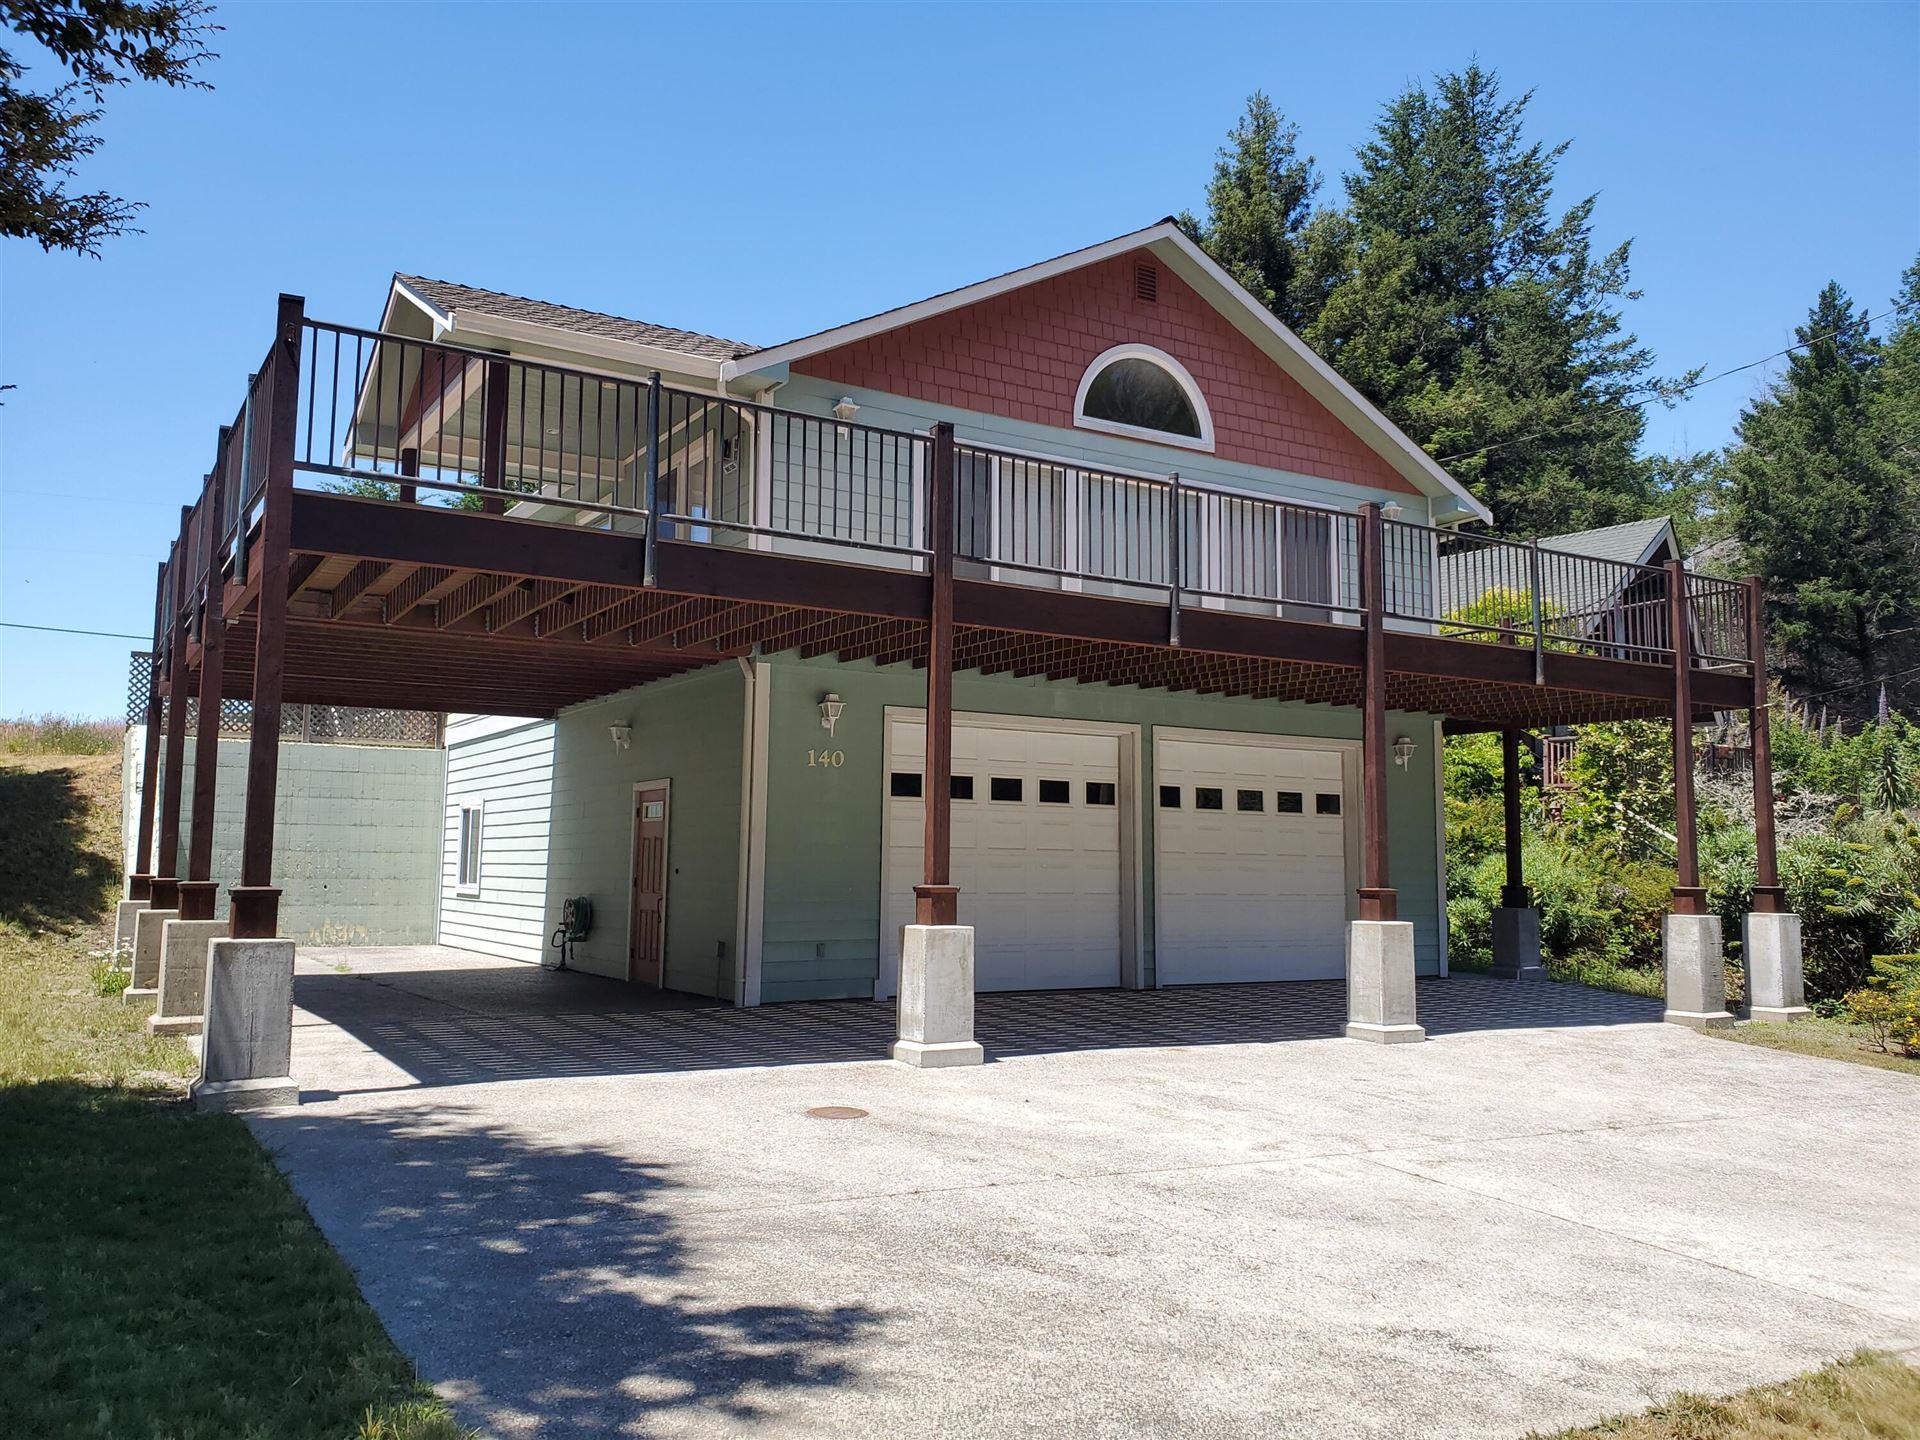 140 Beach Road, Shelter Cove, CA 95589 - MLS#: 259253